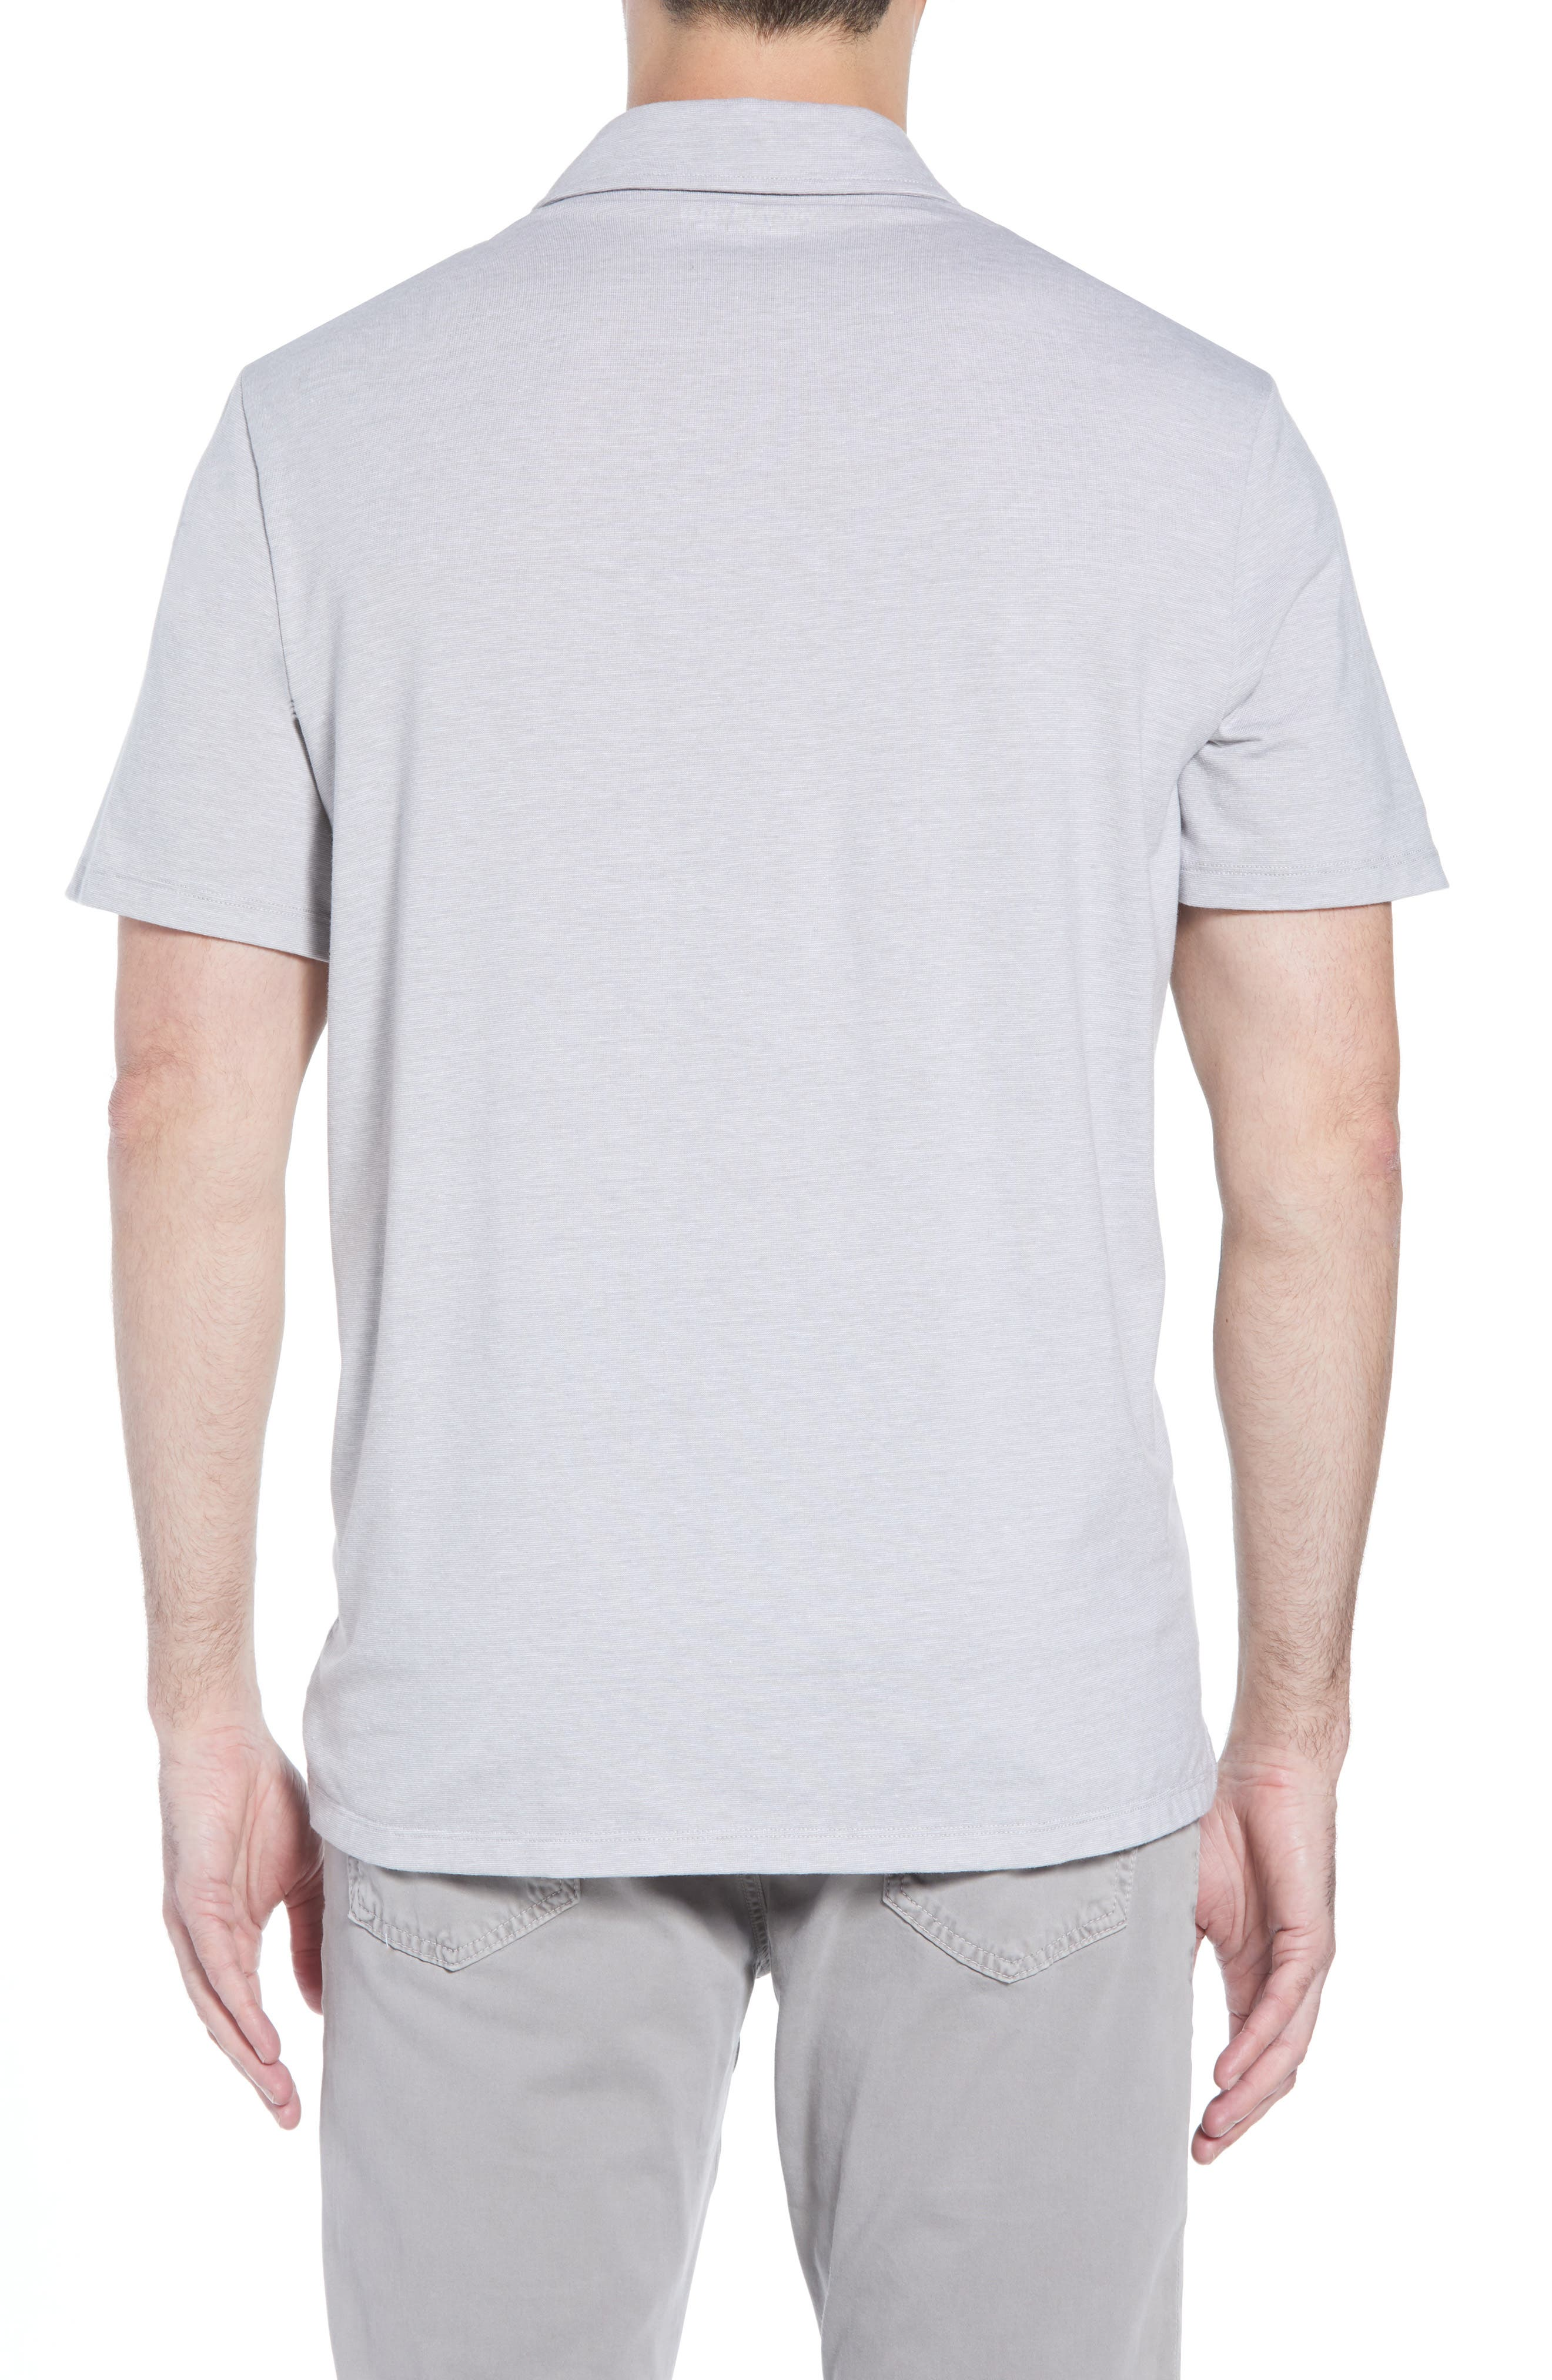 Edgartown Polo Shirt,                             Alternate thumbnail 2, color,                             MONUMENT GRAY